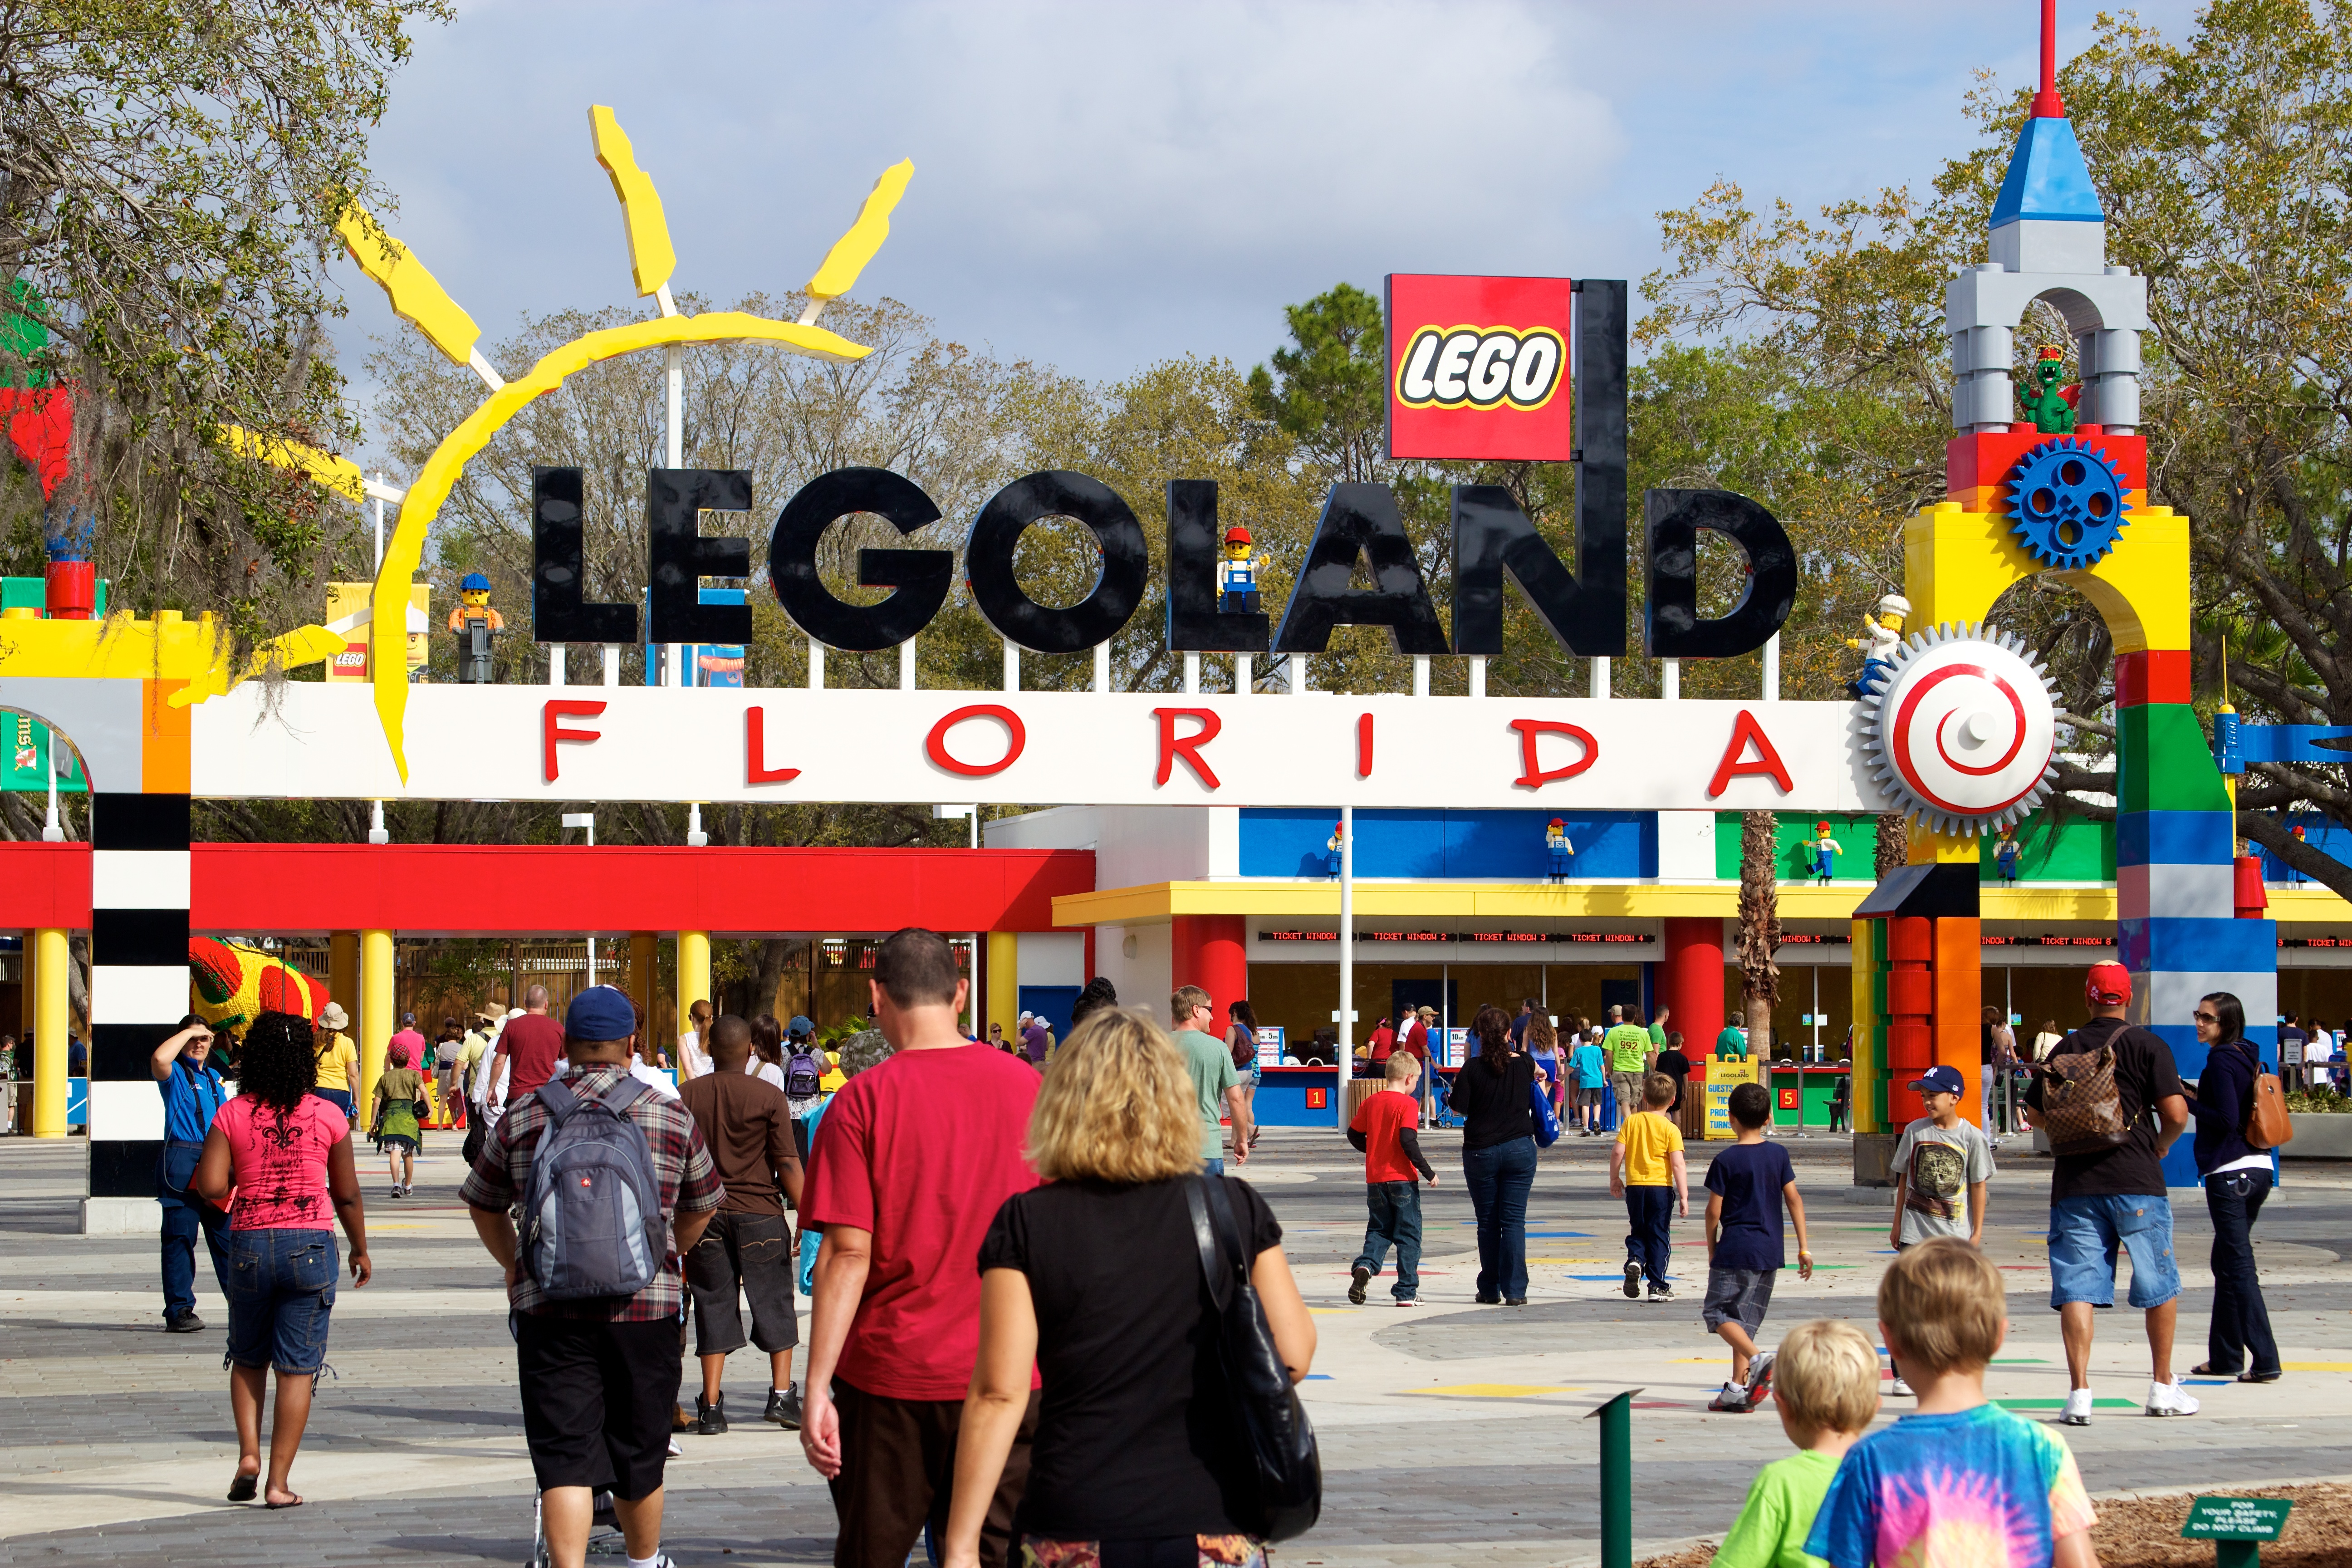 Legoland Florida - Wikipedia